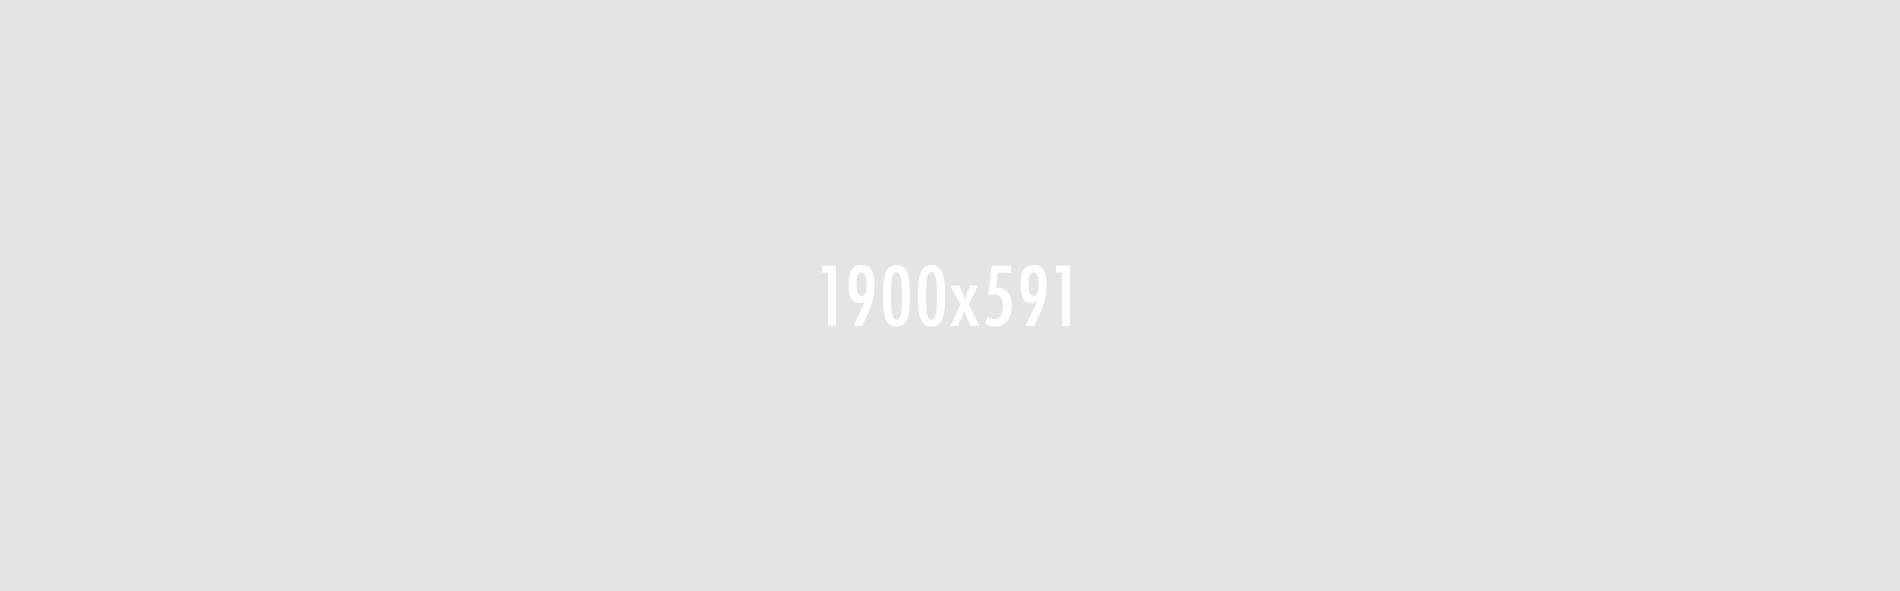 slider3-150x150.png